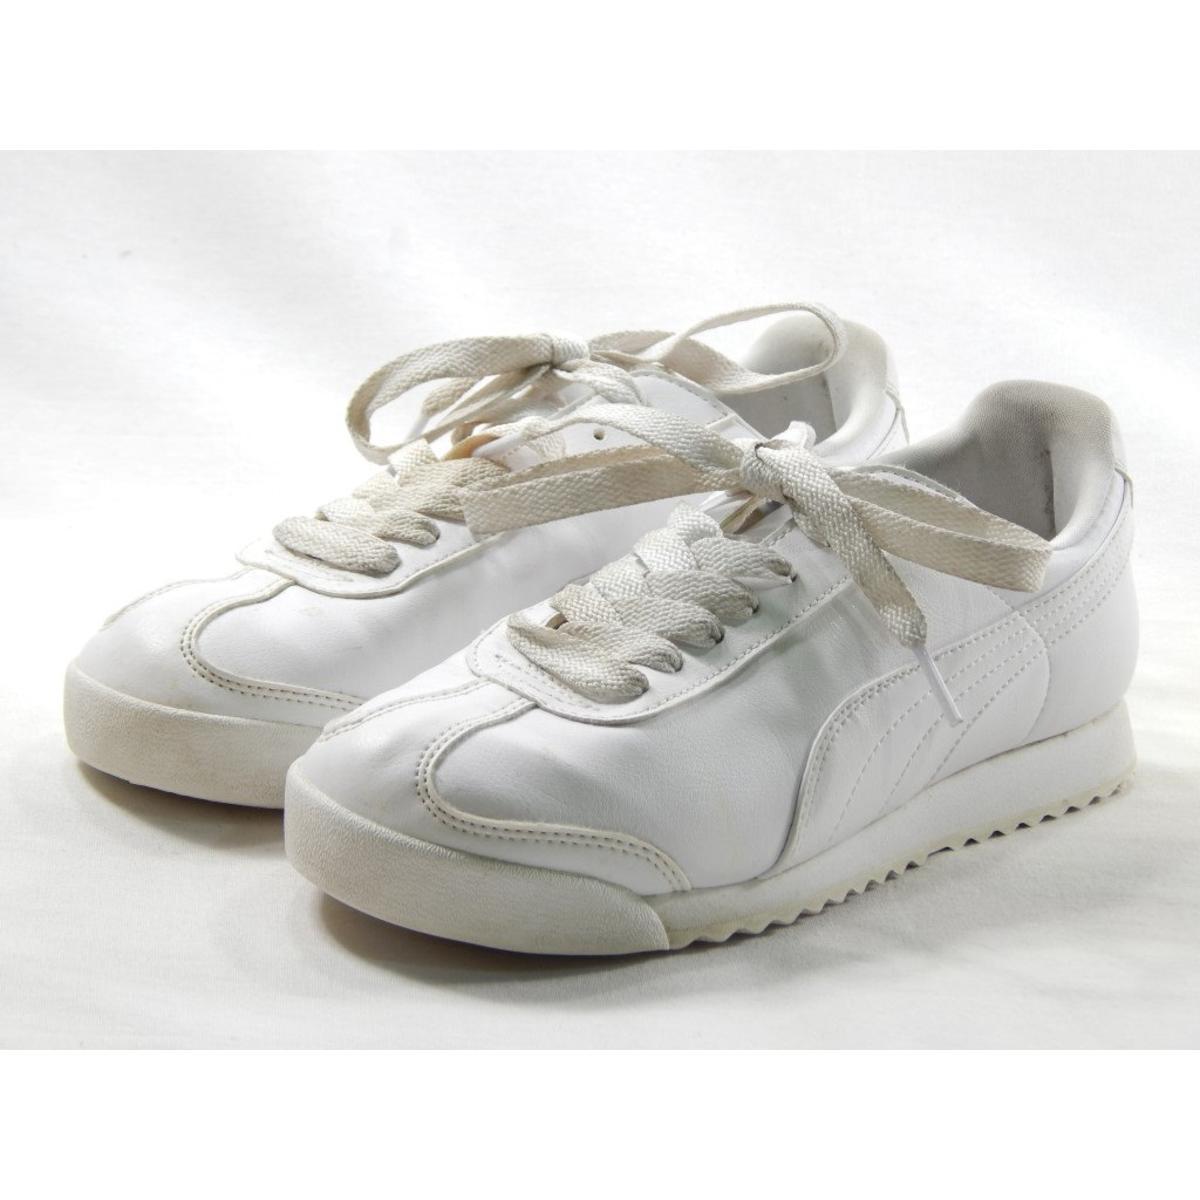 Puma Basic Classicgris Sneaker 8mEbay Claro Para Mujer Roma Blanco UGLqVpMSz